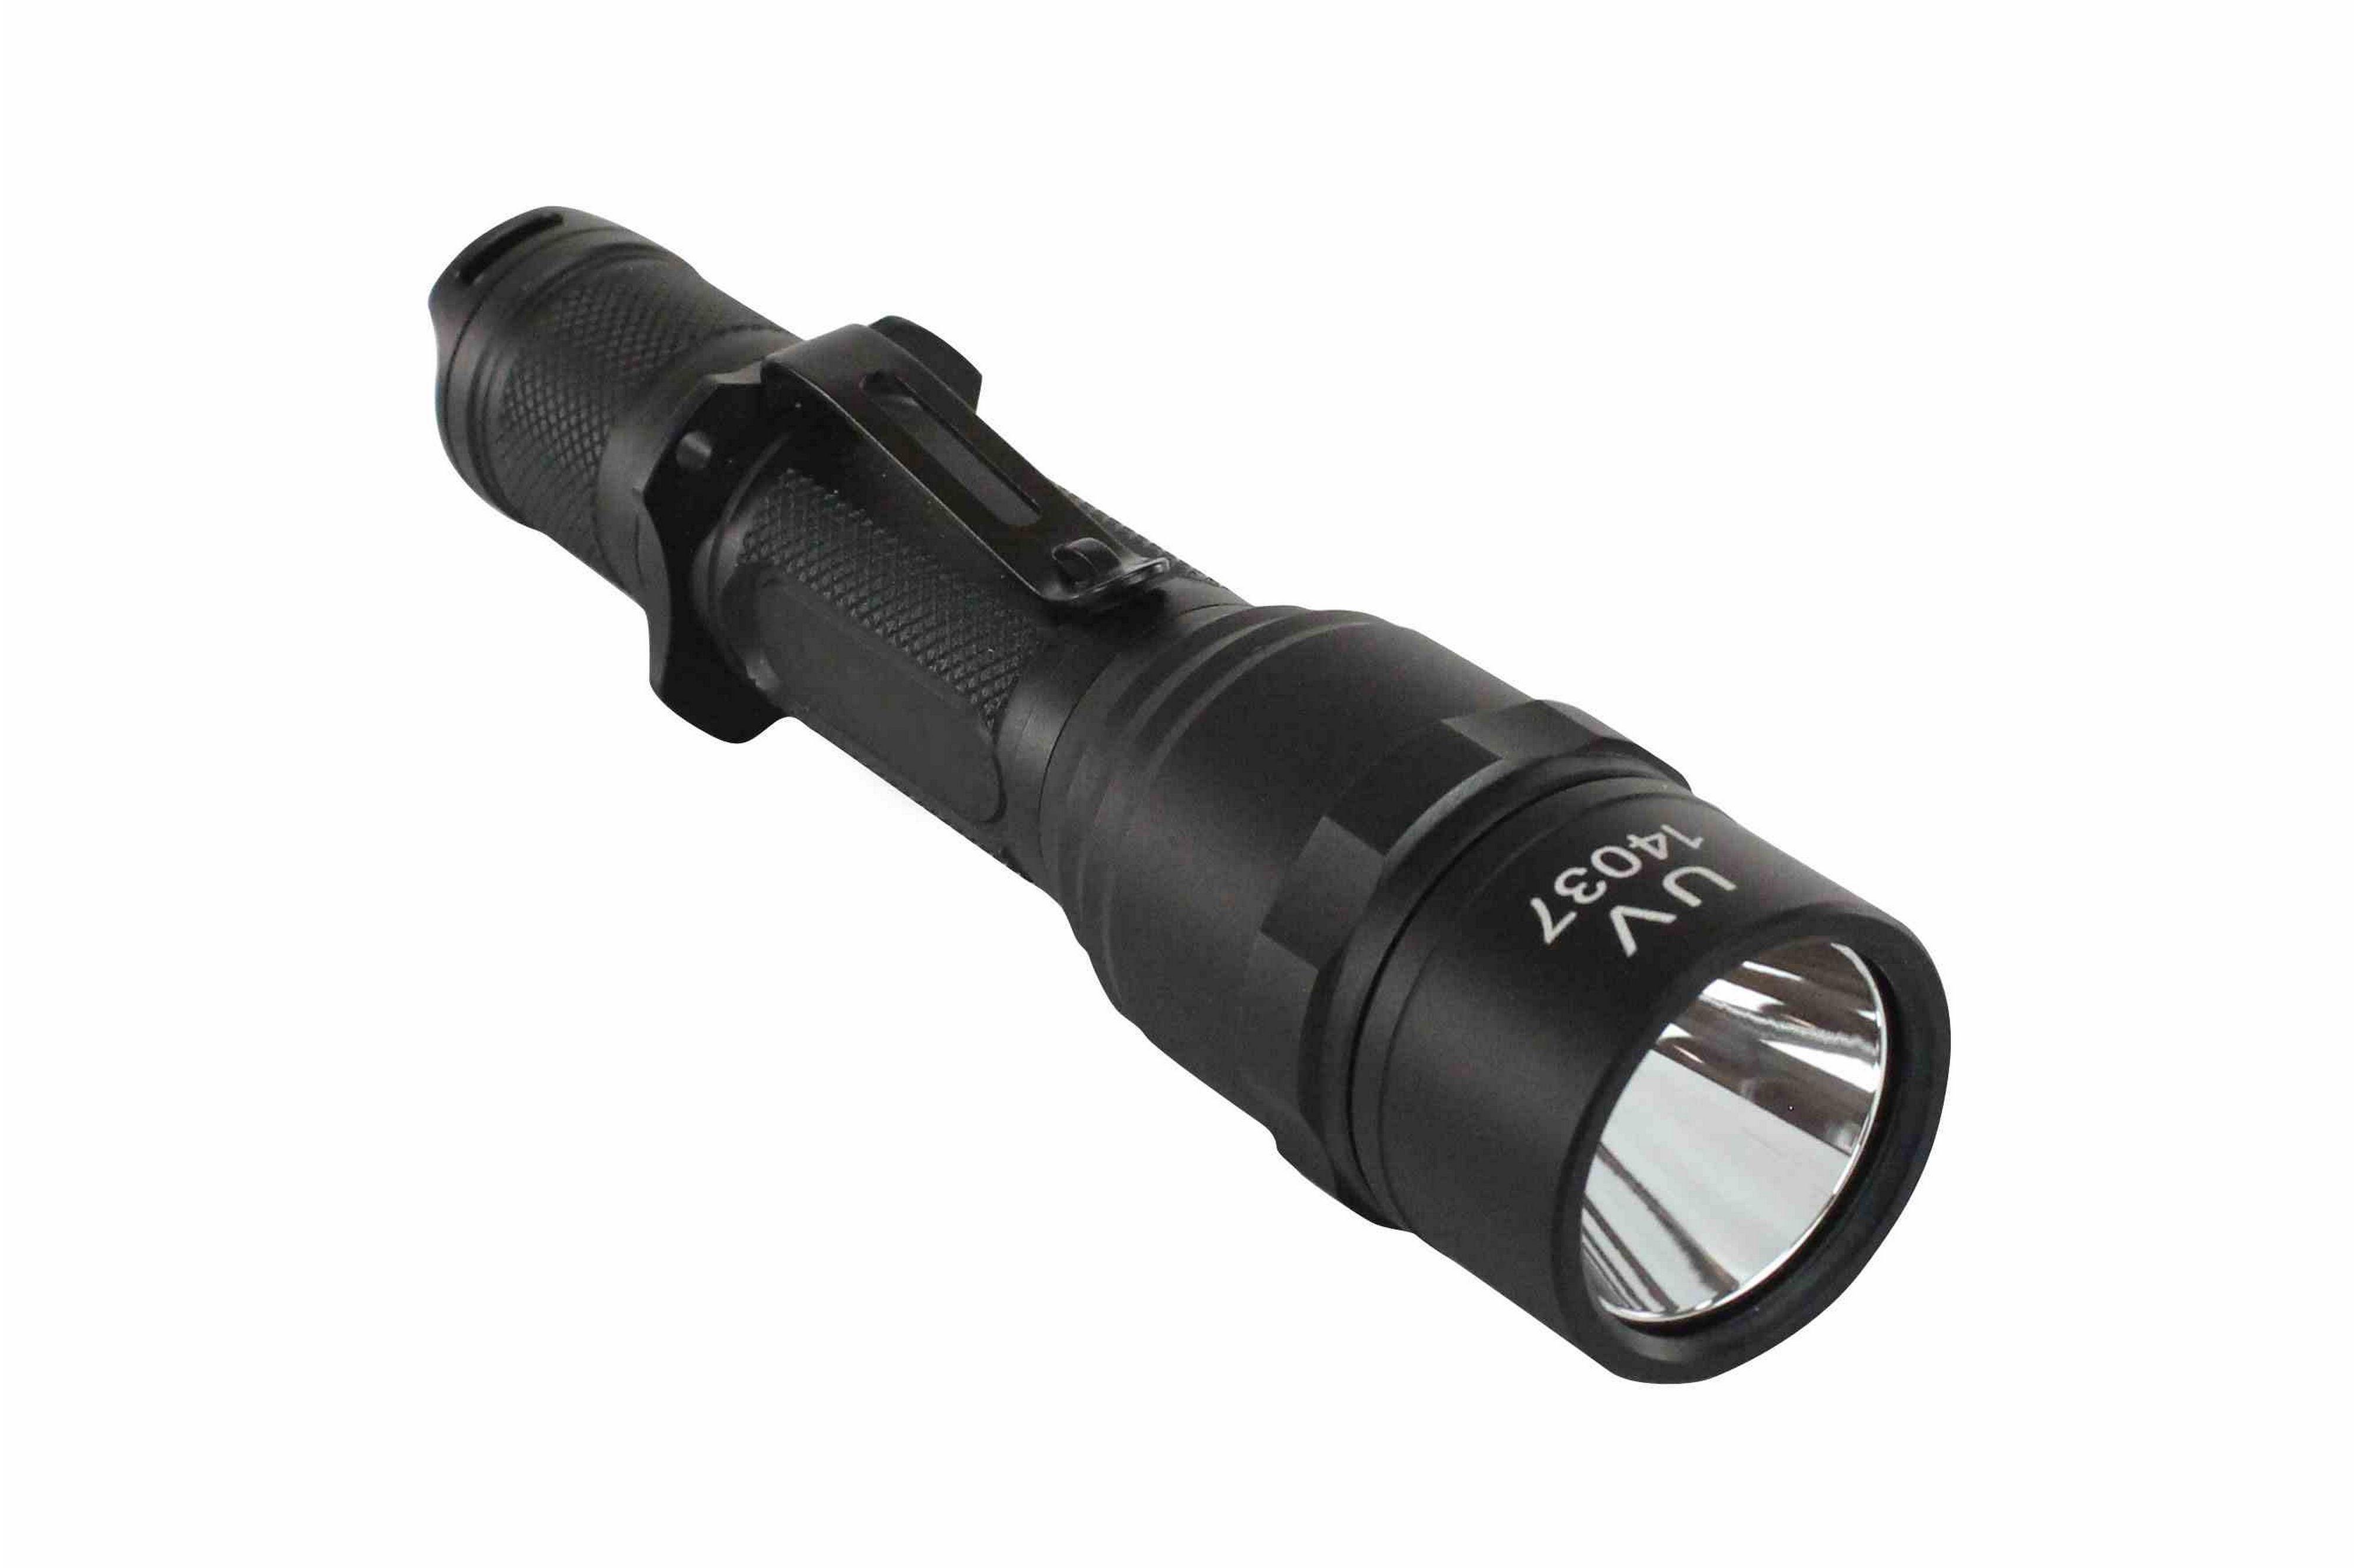 Rechargeable Uv Led Flashlight Accessory Kit